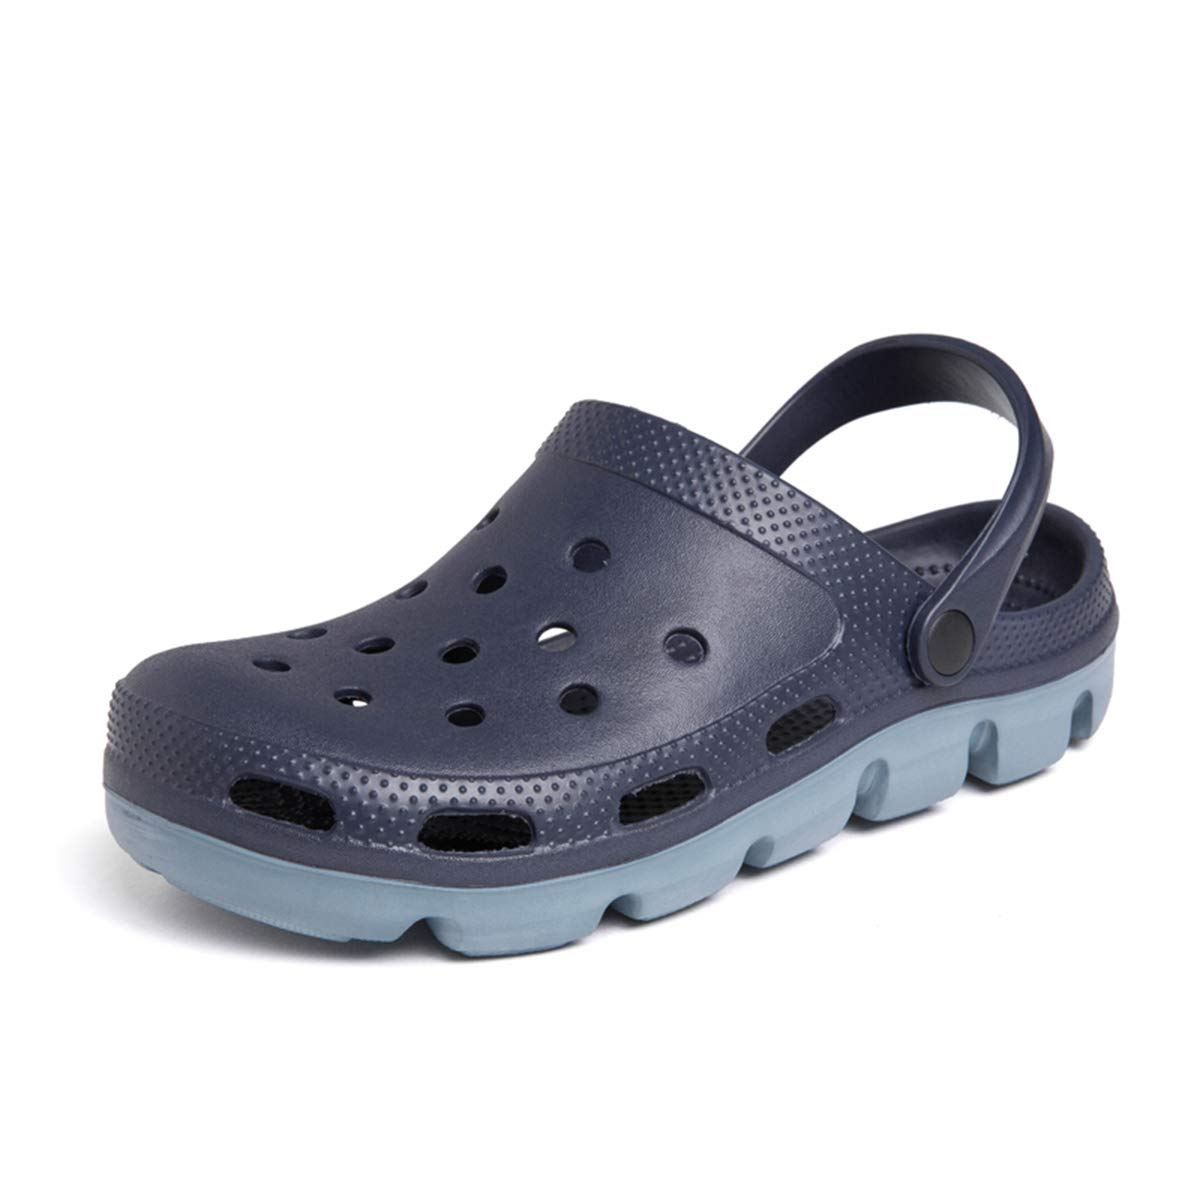 HSBUY Men's Clogs Slip on Water Shoes Casual Summer Clog Classic Clog Shoes Comfort Garden Anti Slip Black